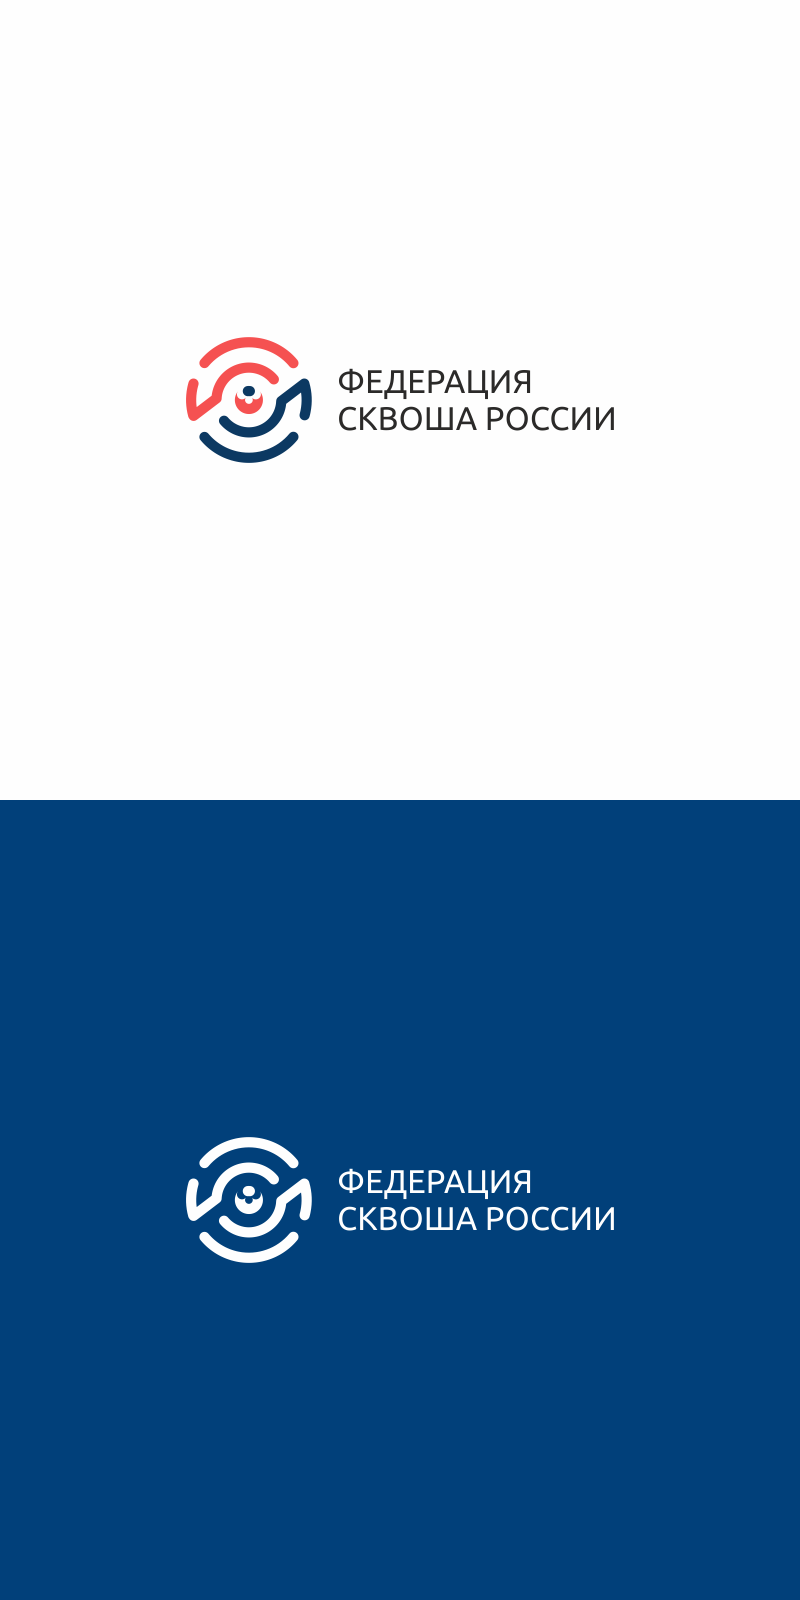 Разработать логотип для Федерации сквоша России фото f_4985f396f7e357df.png